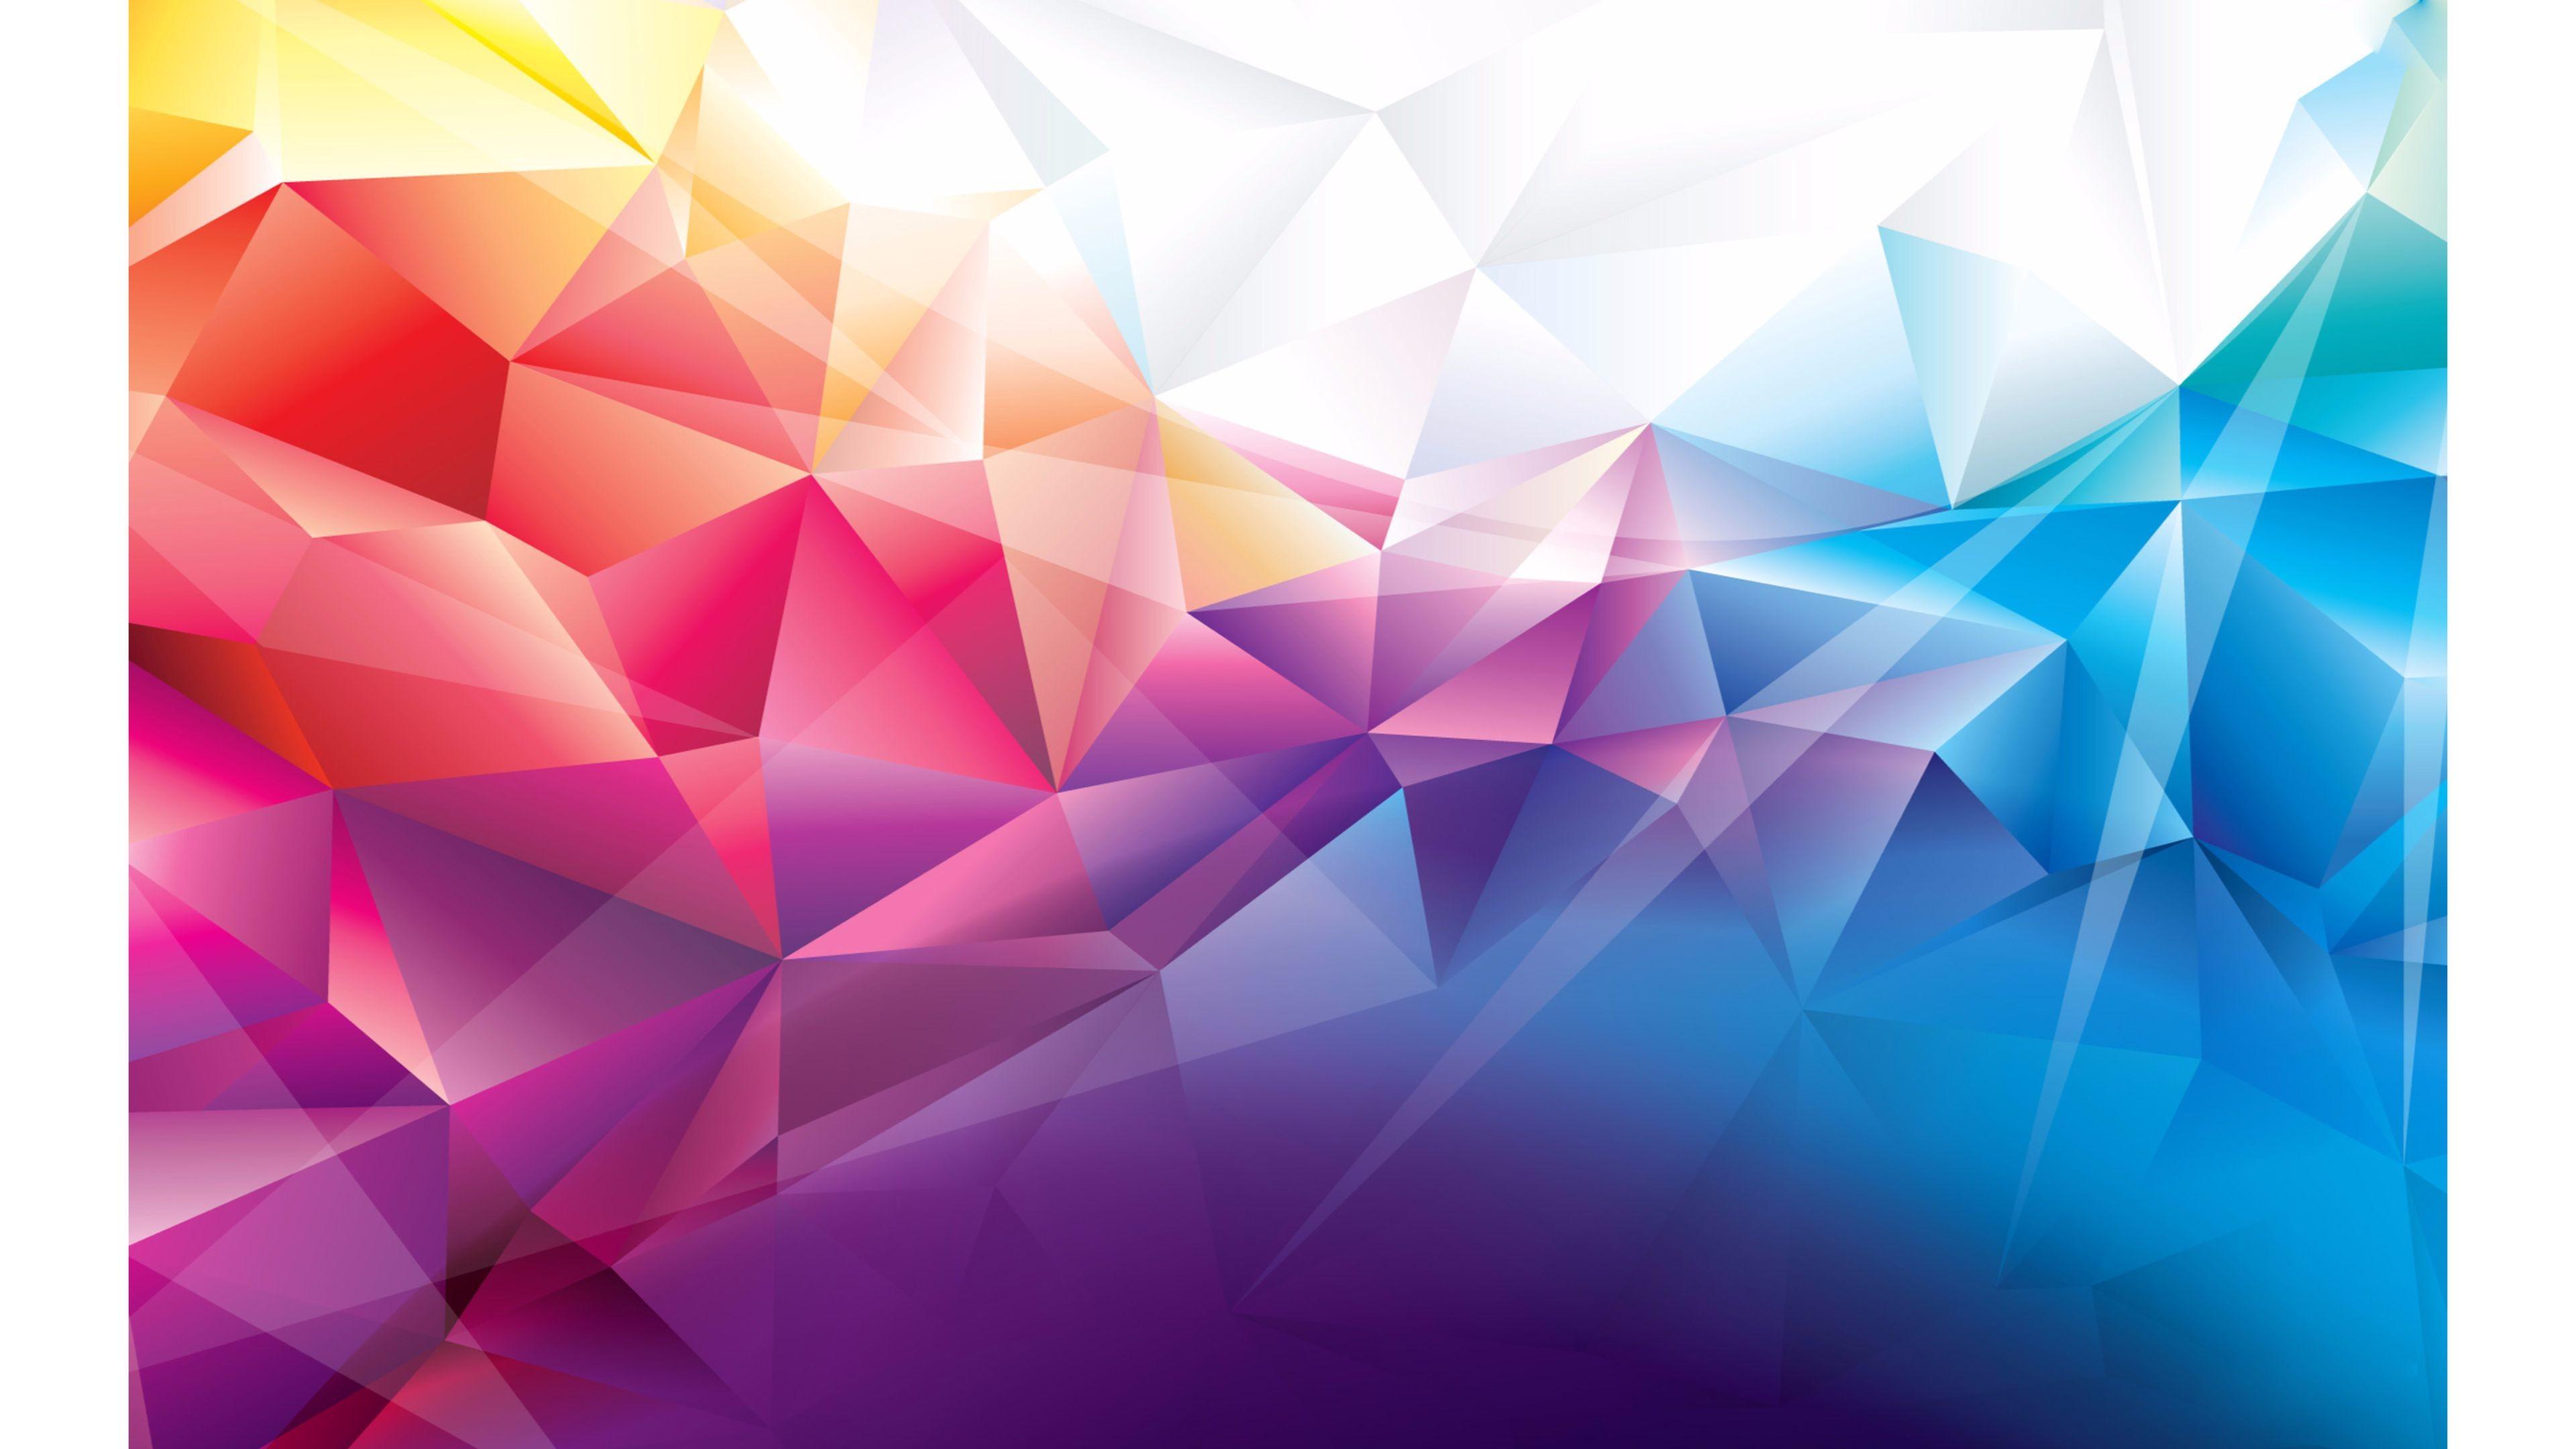 abstract wallpaper 4k – Wallpul HD Wallpapers